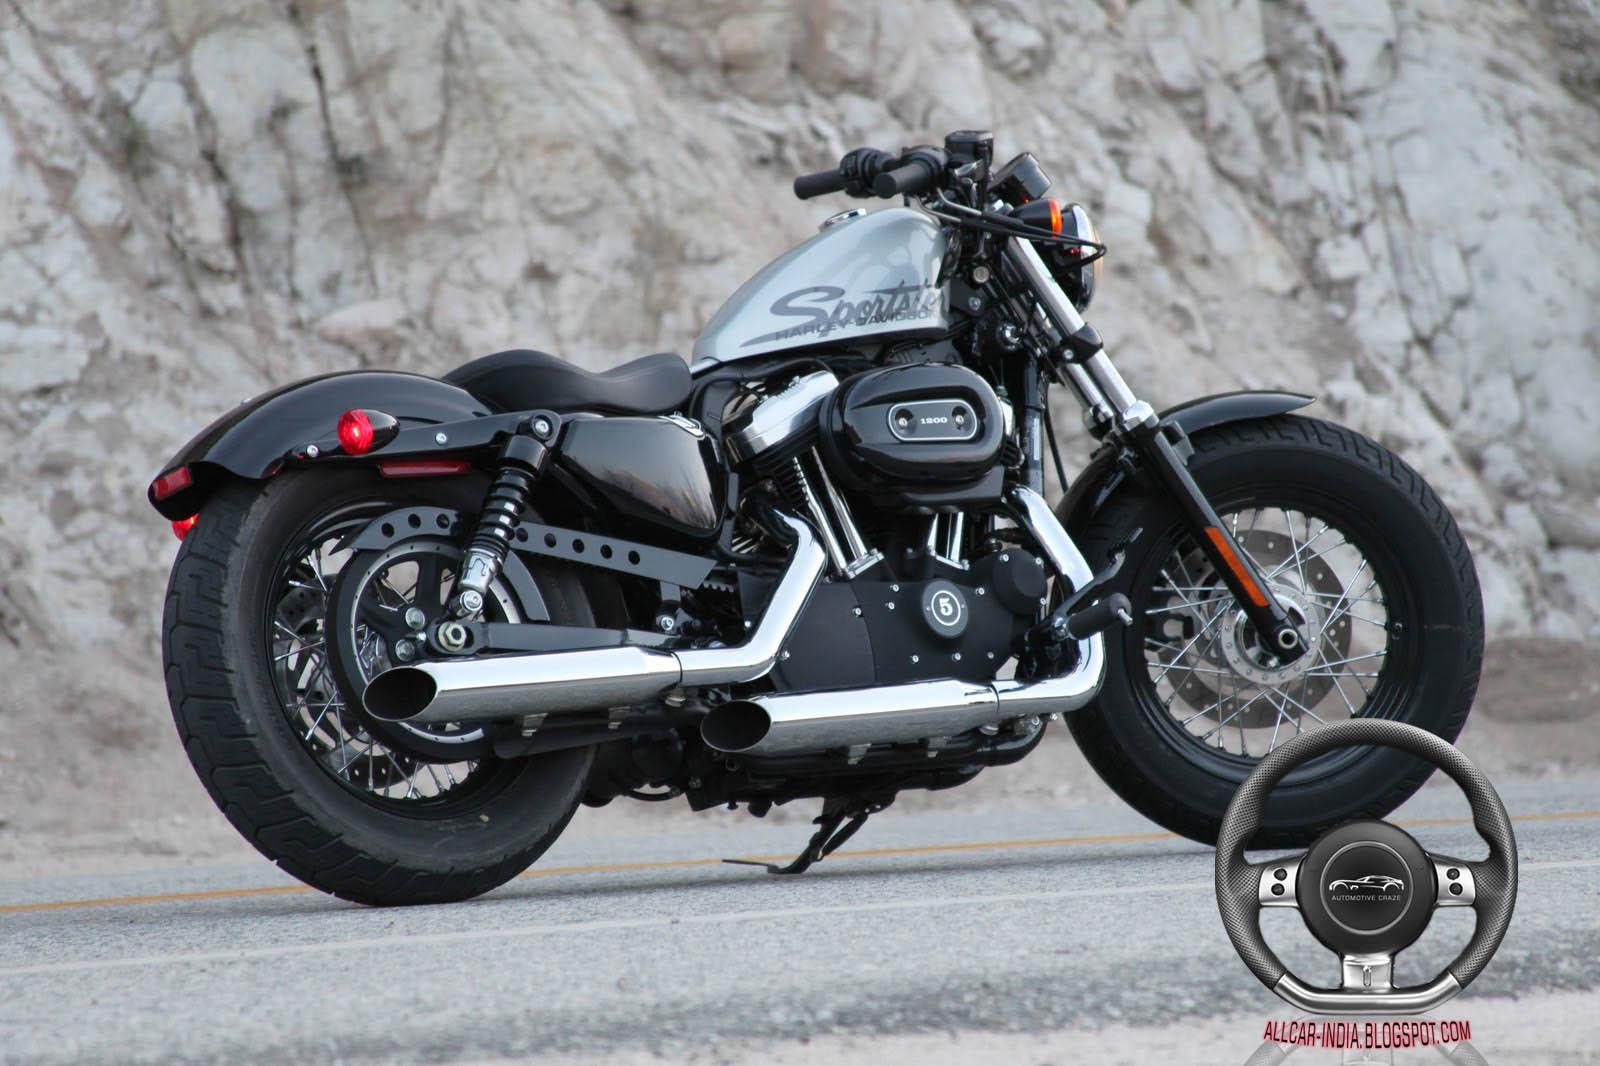 Harley Davidson Superlow Price In Kochi